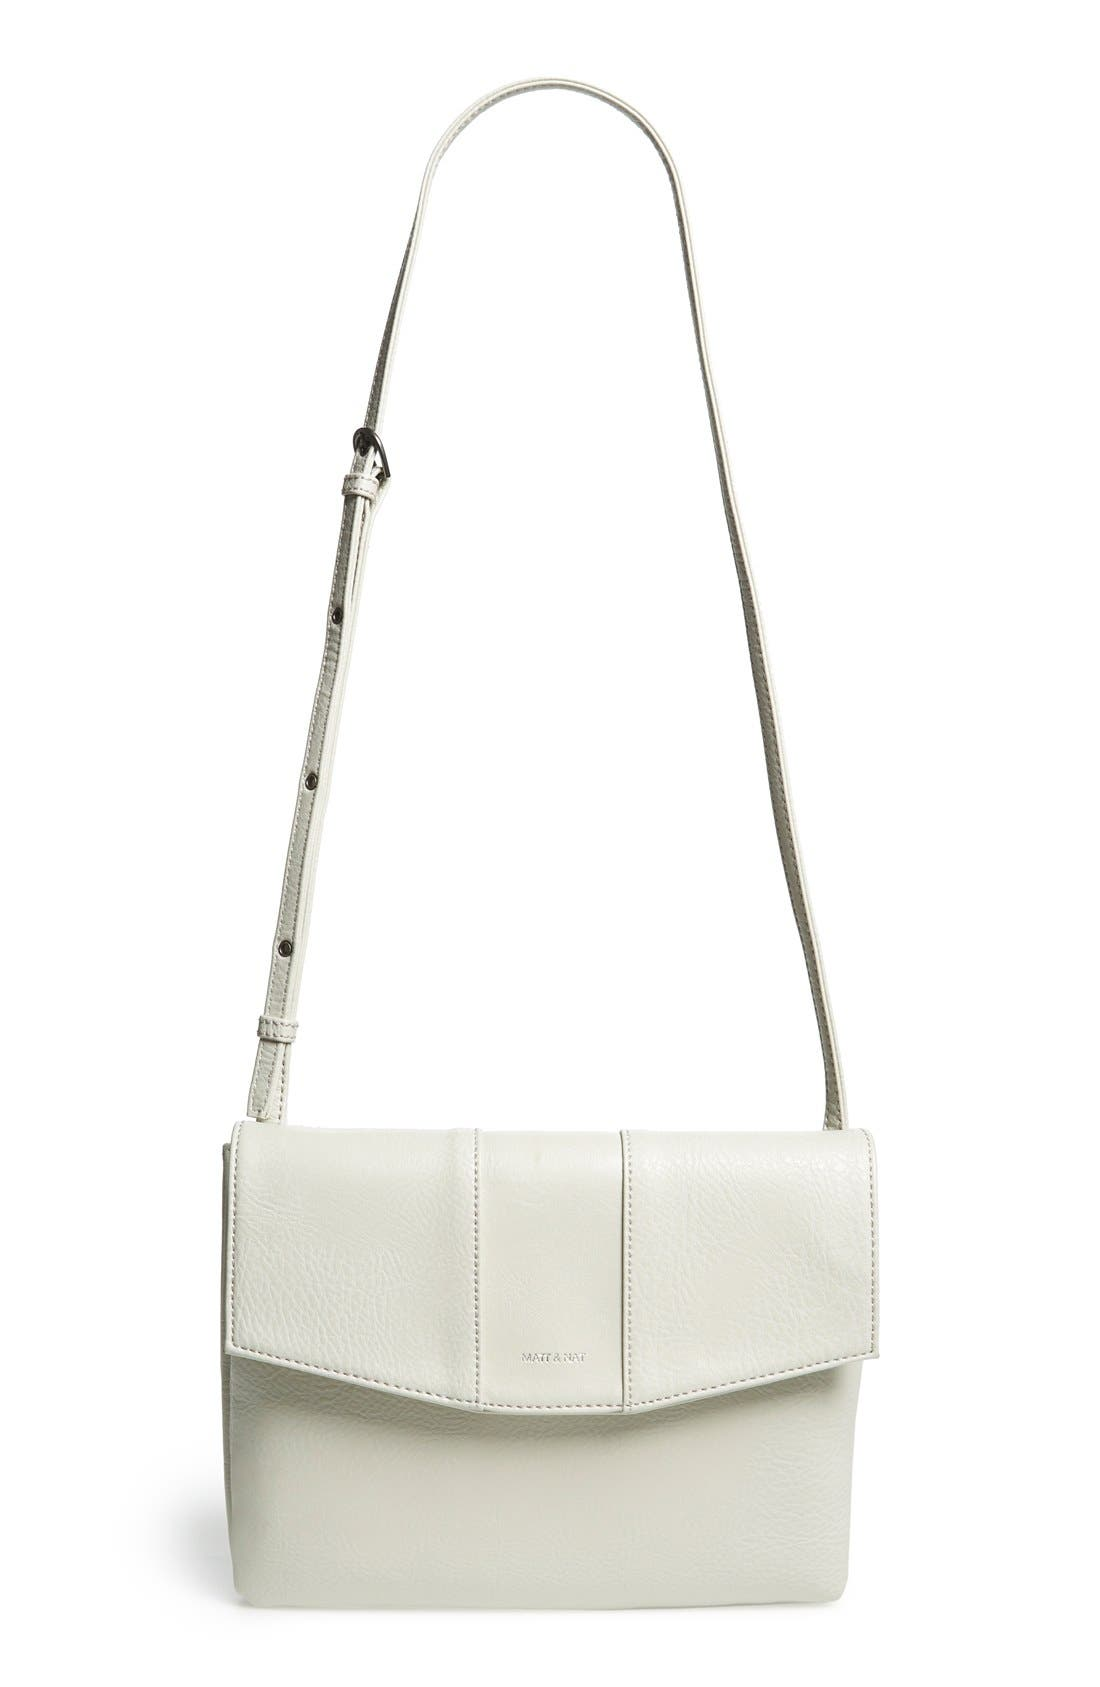 Main Image - Matt & Nat 'Eeha' Vegan Leather Crossbody Bag